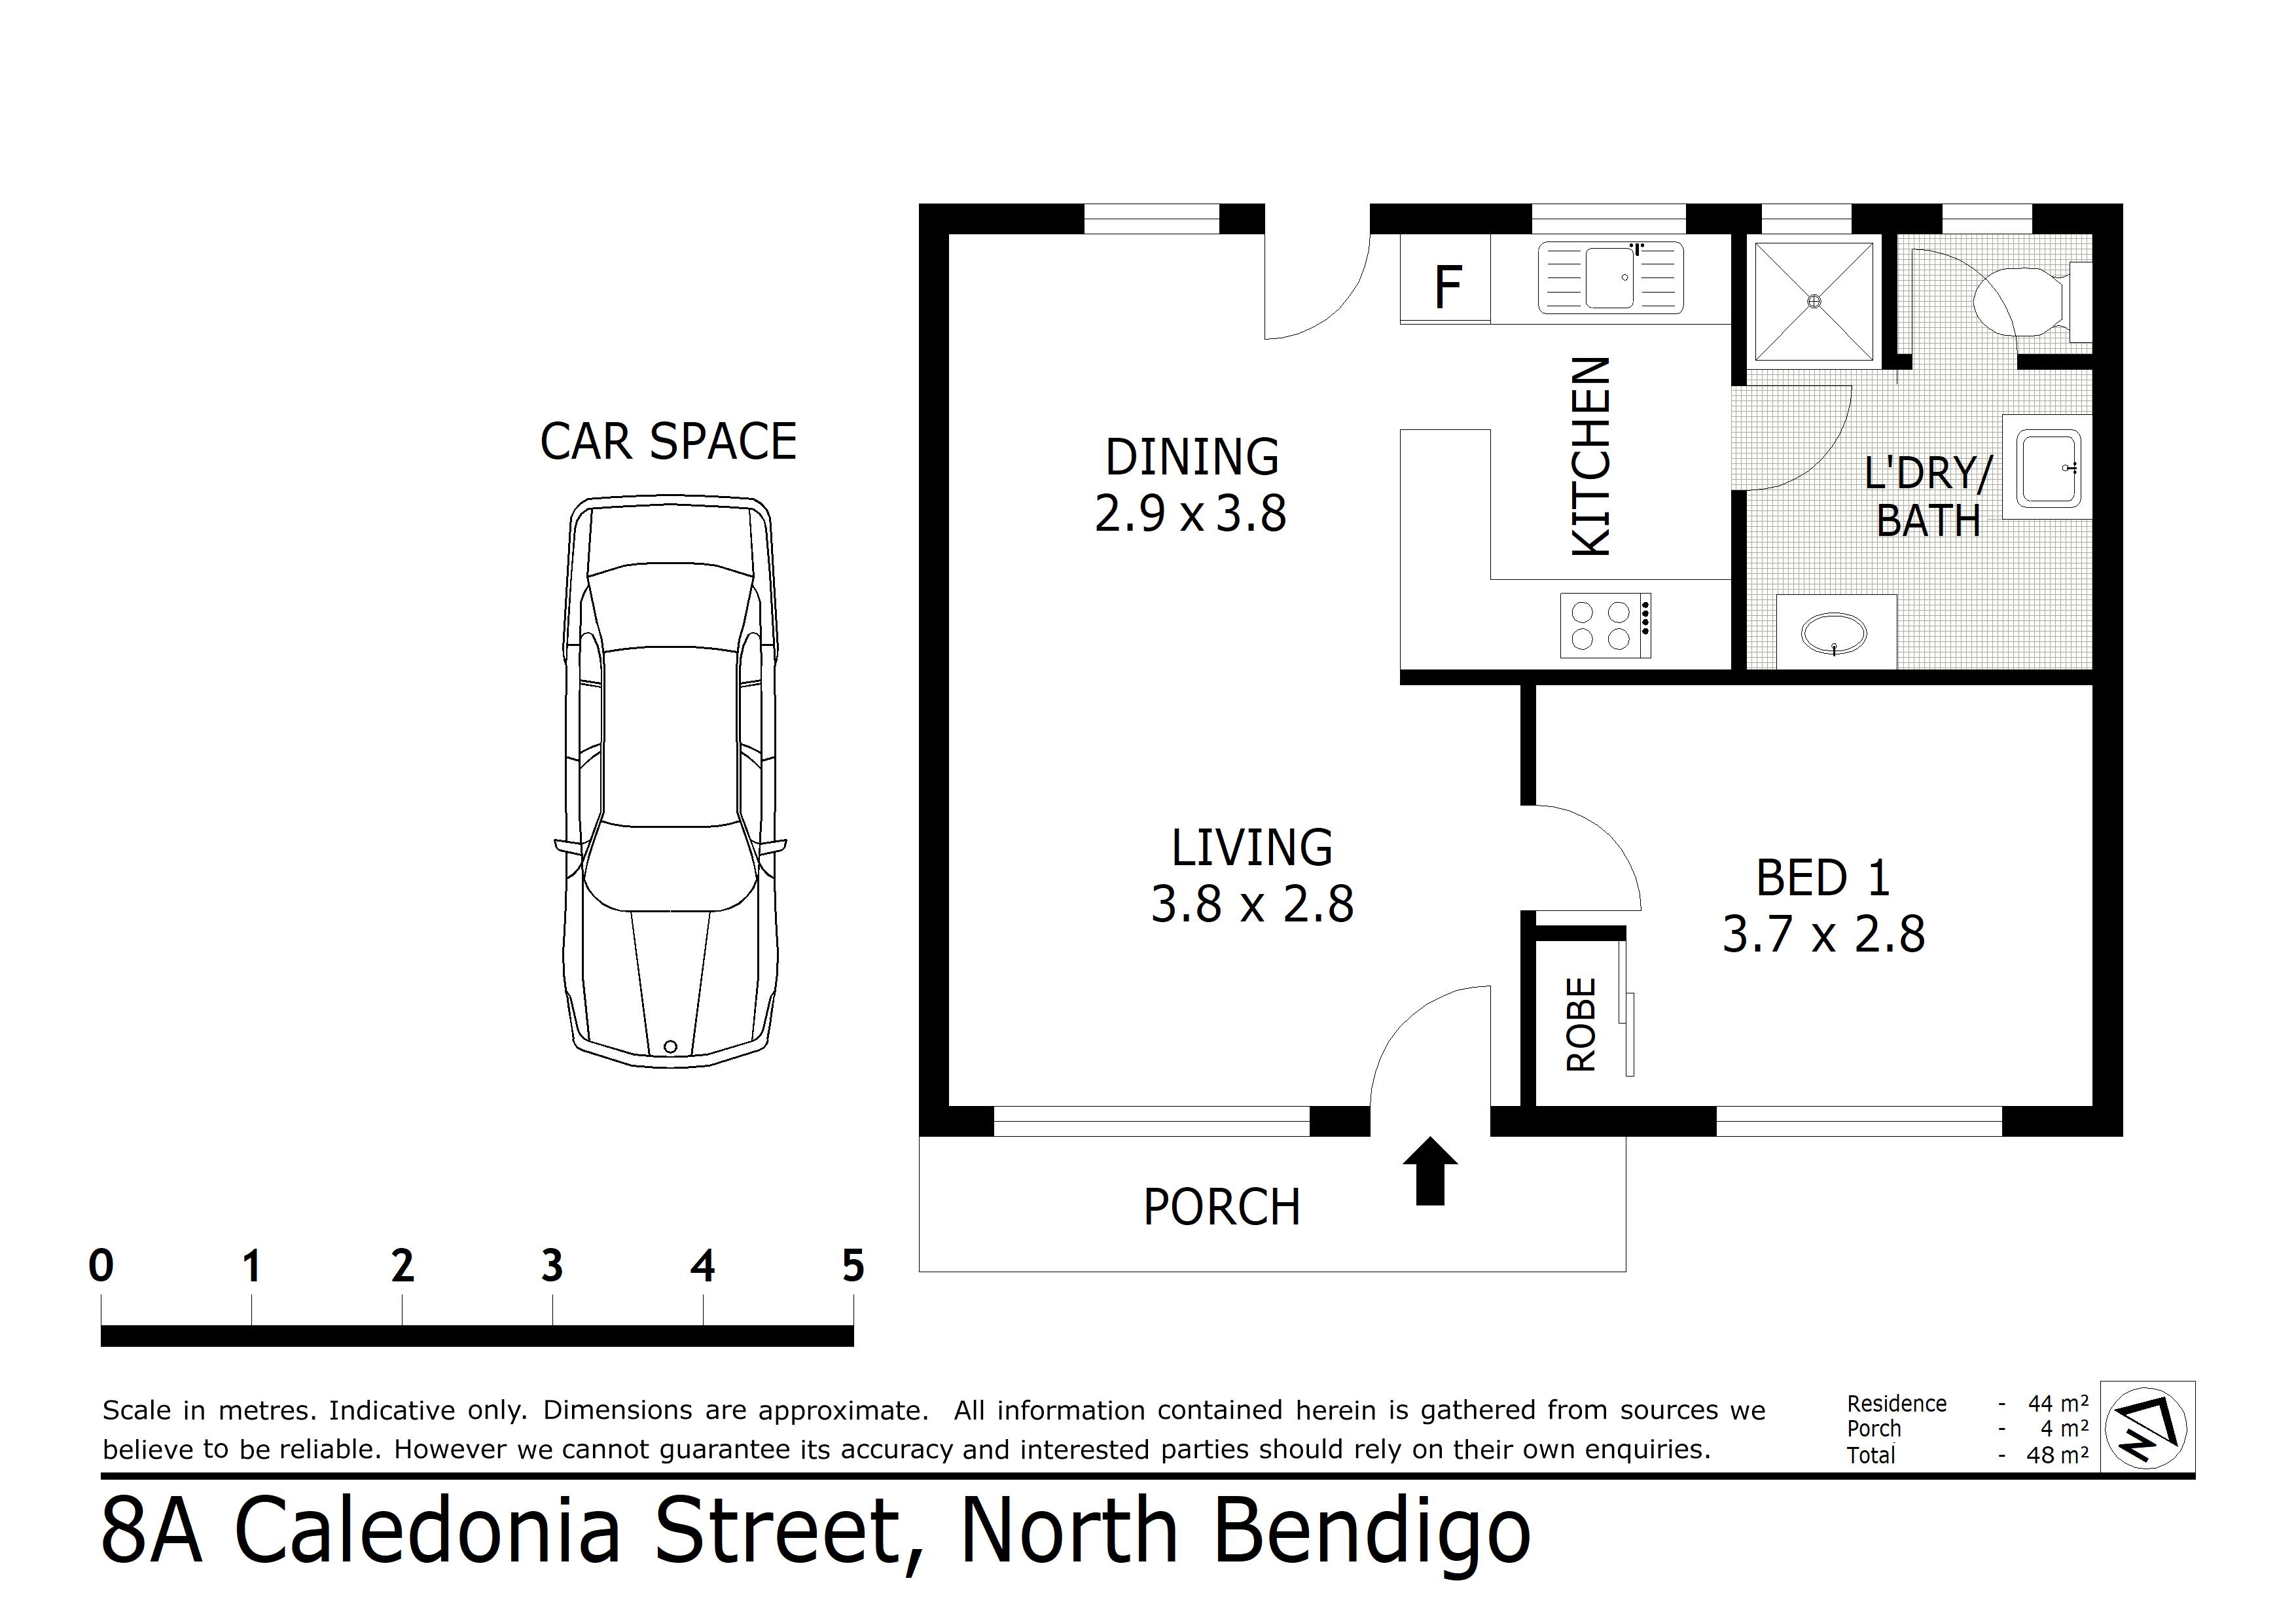 8A Caledonia Street, North Bendigo, VIC 3550